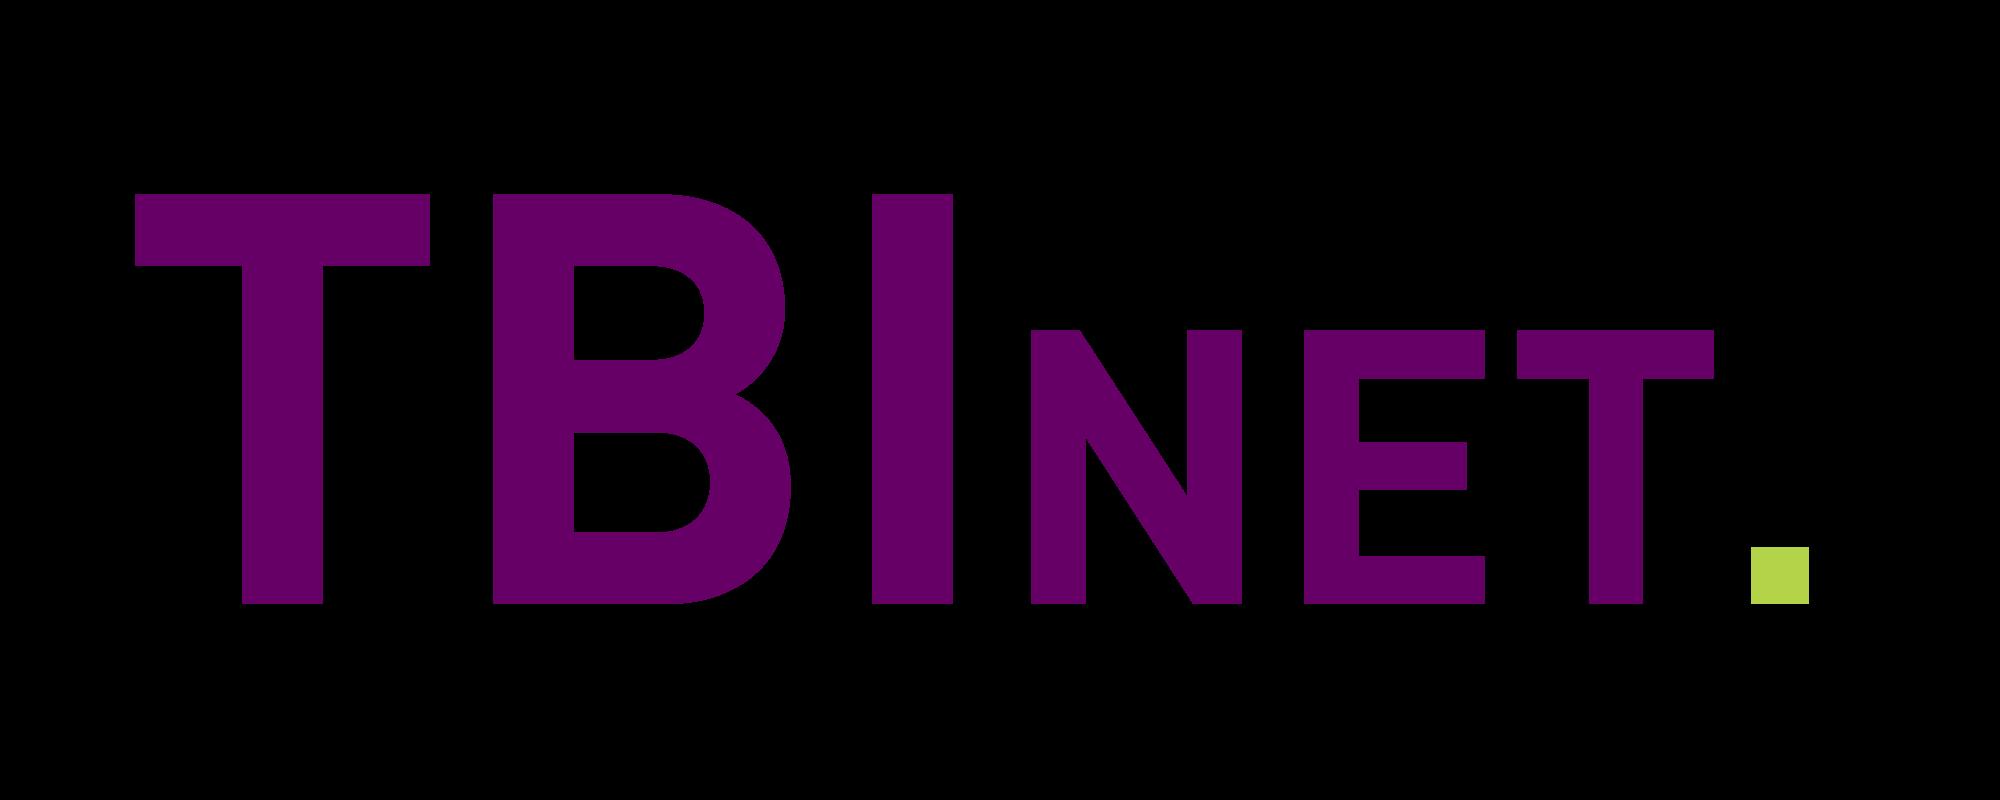 TBInet